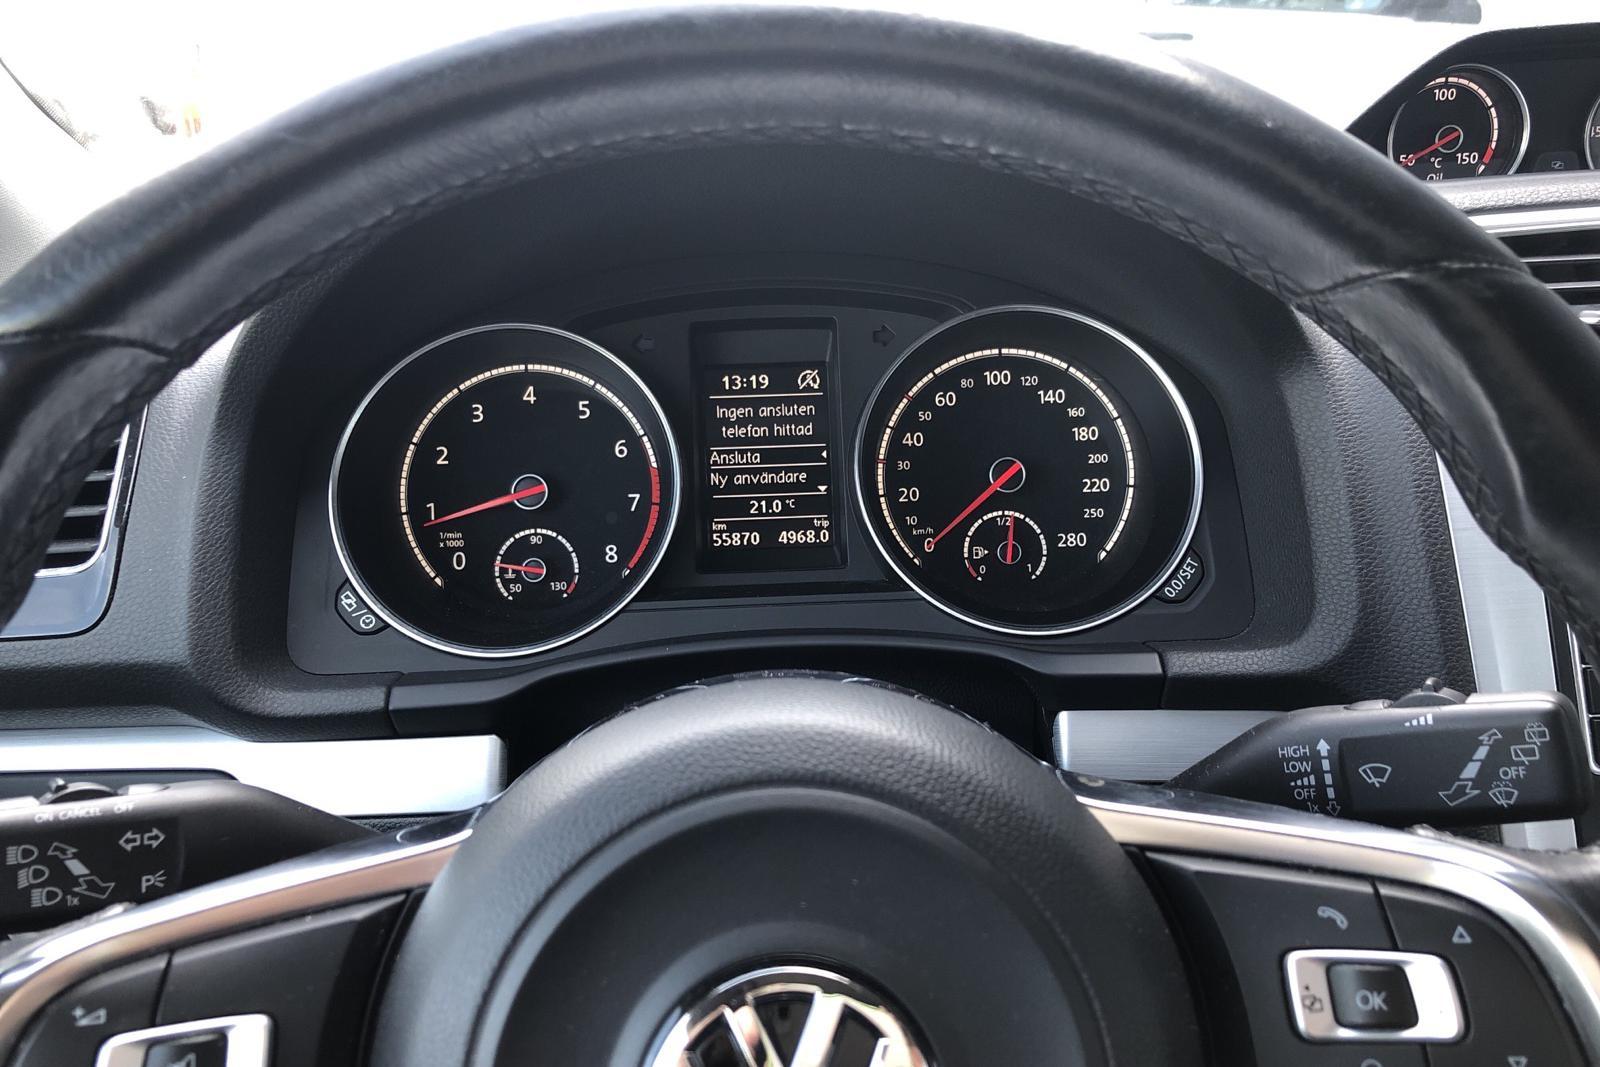 VW Scirocco 1.4 TSI (180hk) - 55 870 km - Manual - white - 2015